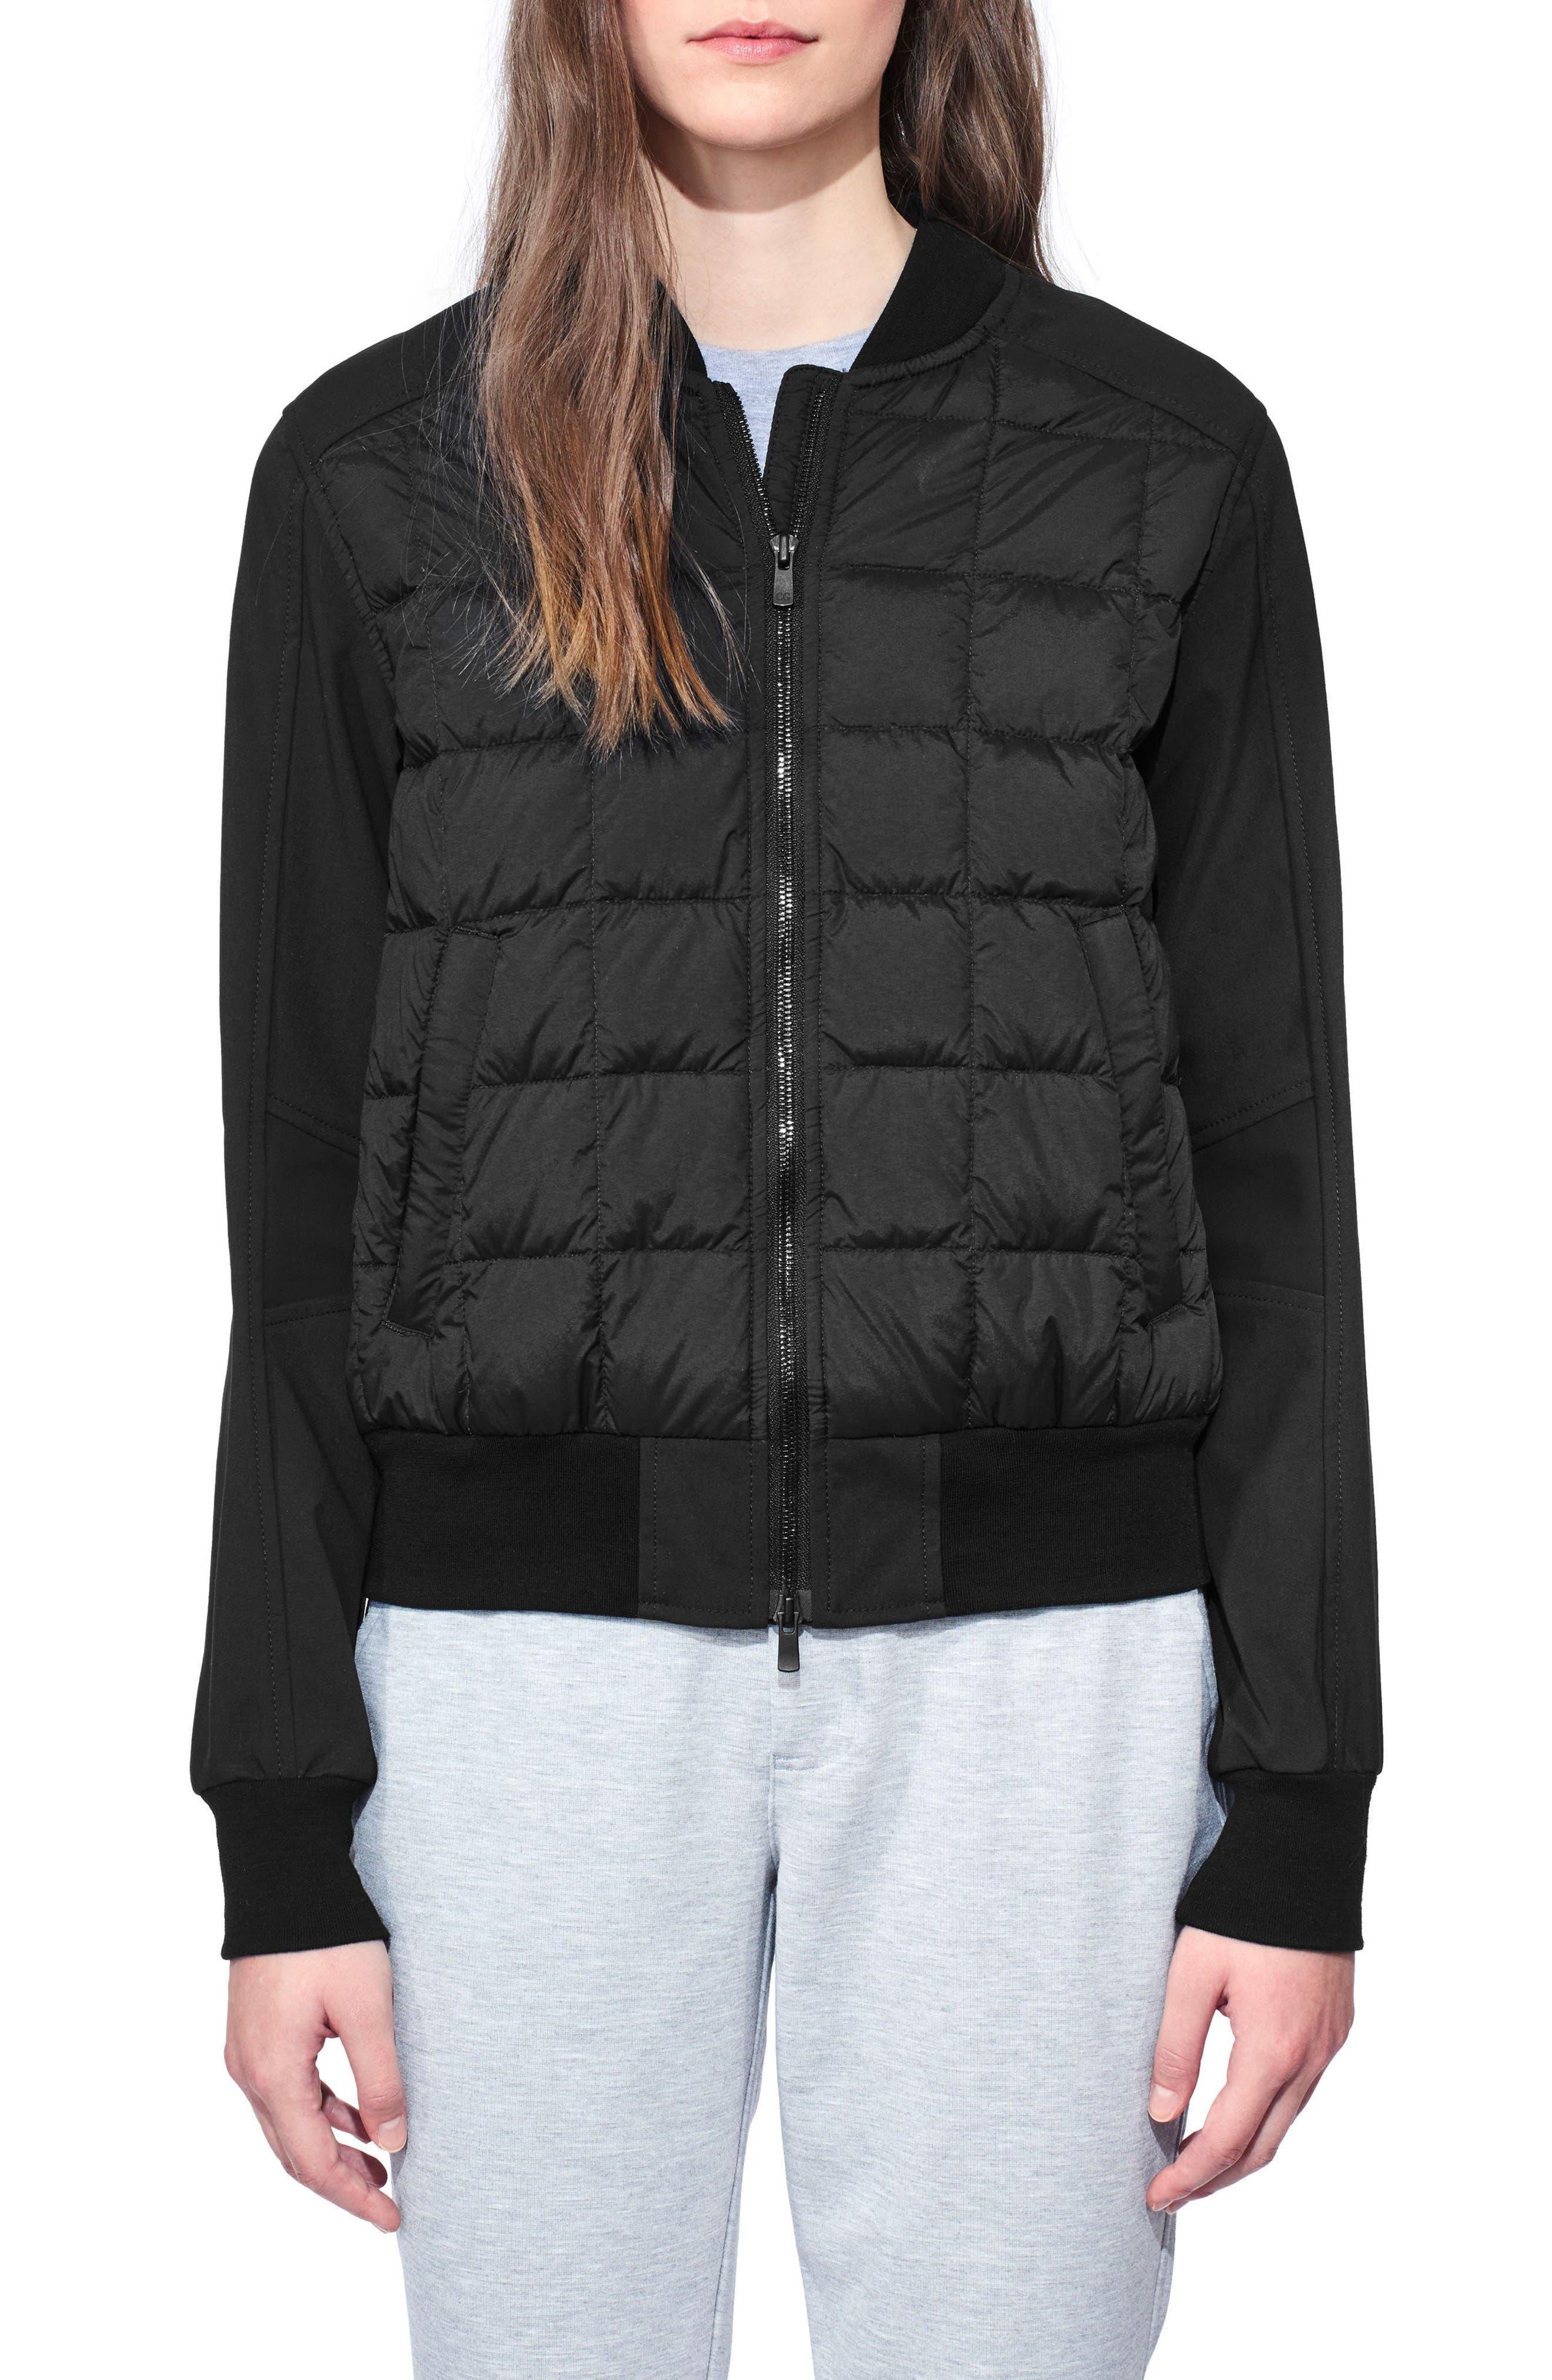 Hanley Down Bomber Jacket,                         Main,                         color, Black/ Black